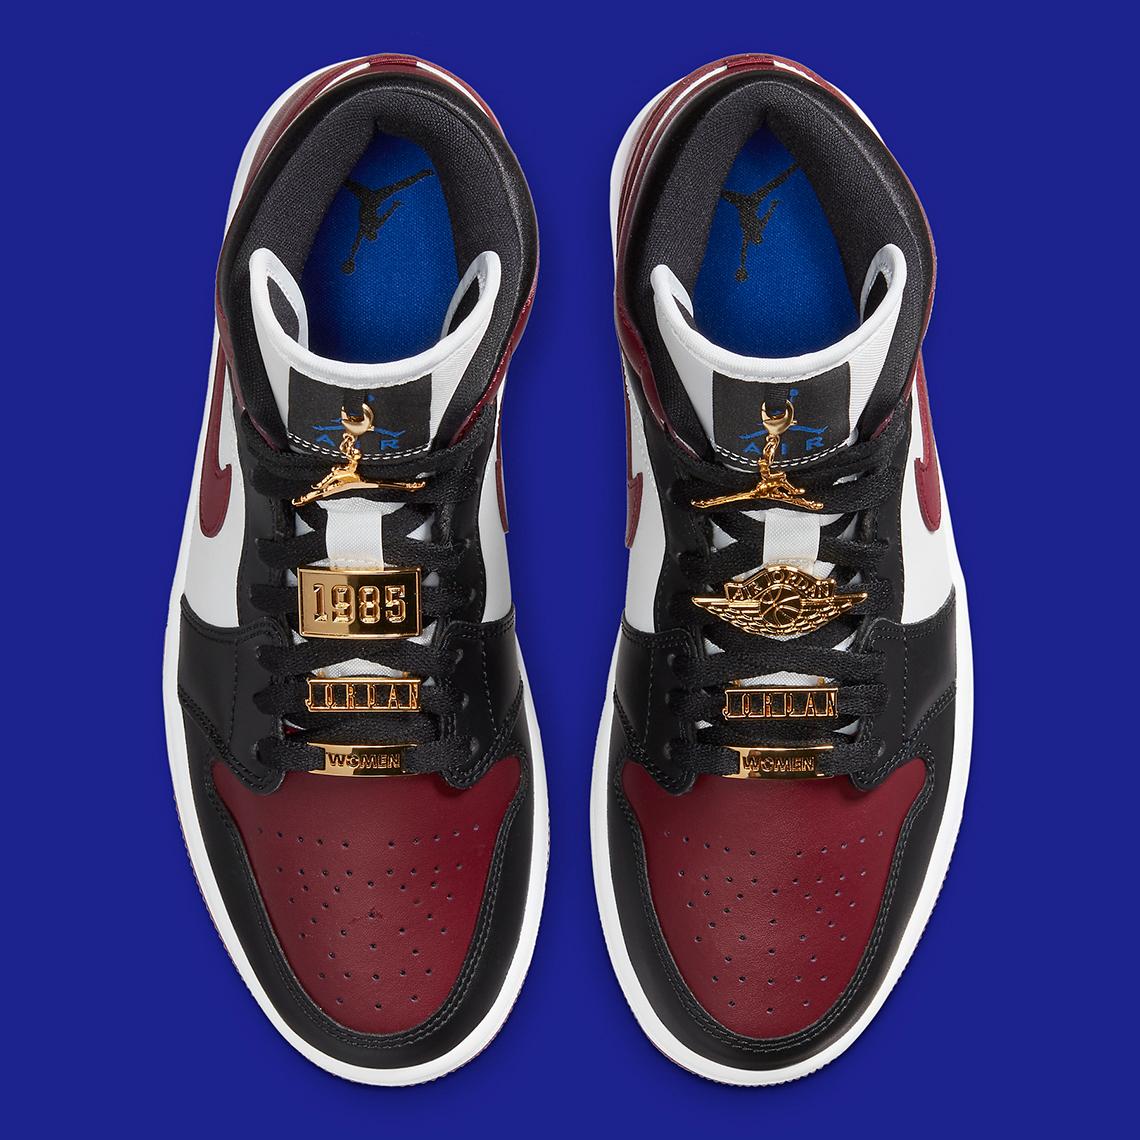 Air Jordan 1 Mid WMNS Maroon Black Gold